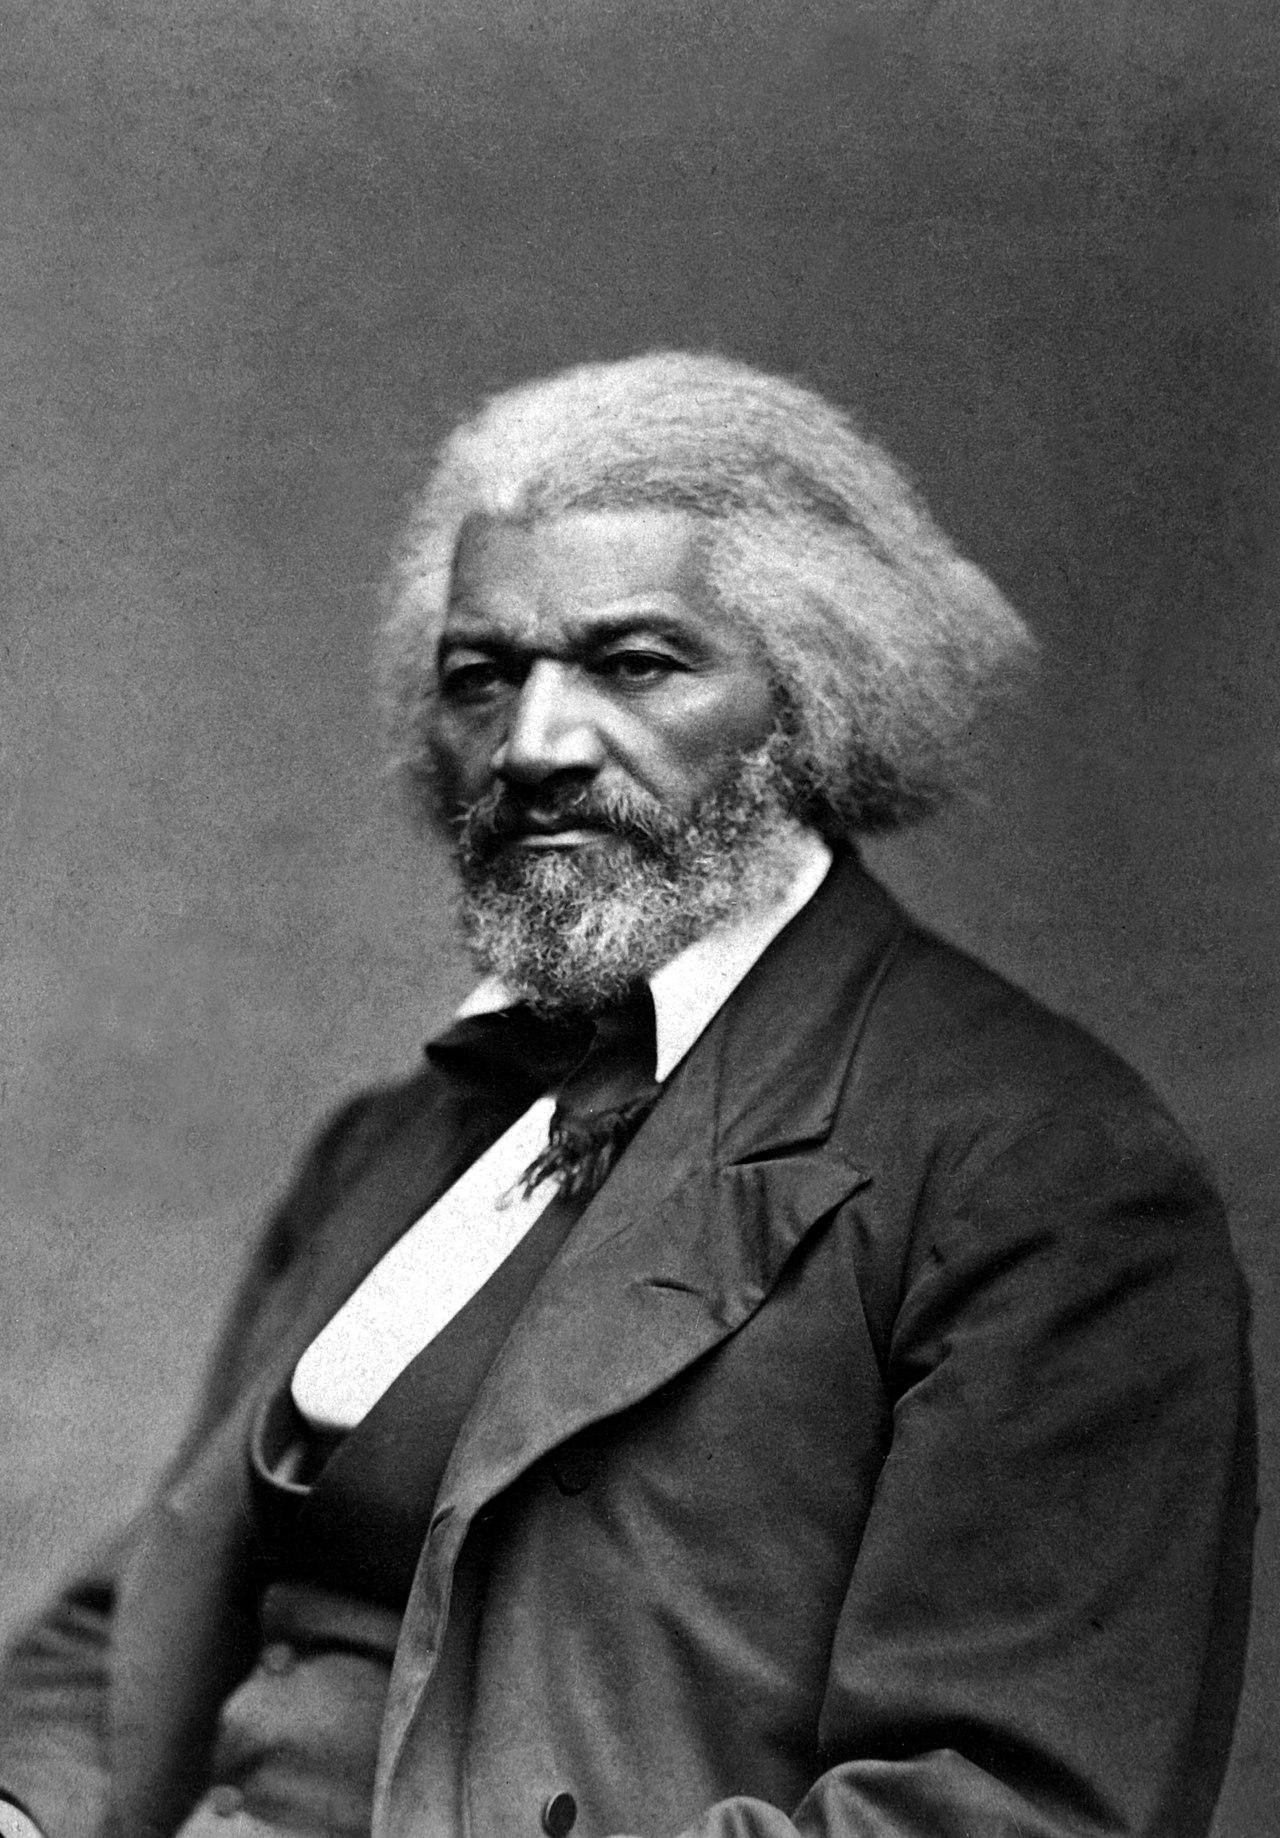 1280px-Frederick_Douglass_%28circa_1879%29.jpg